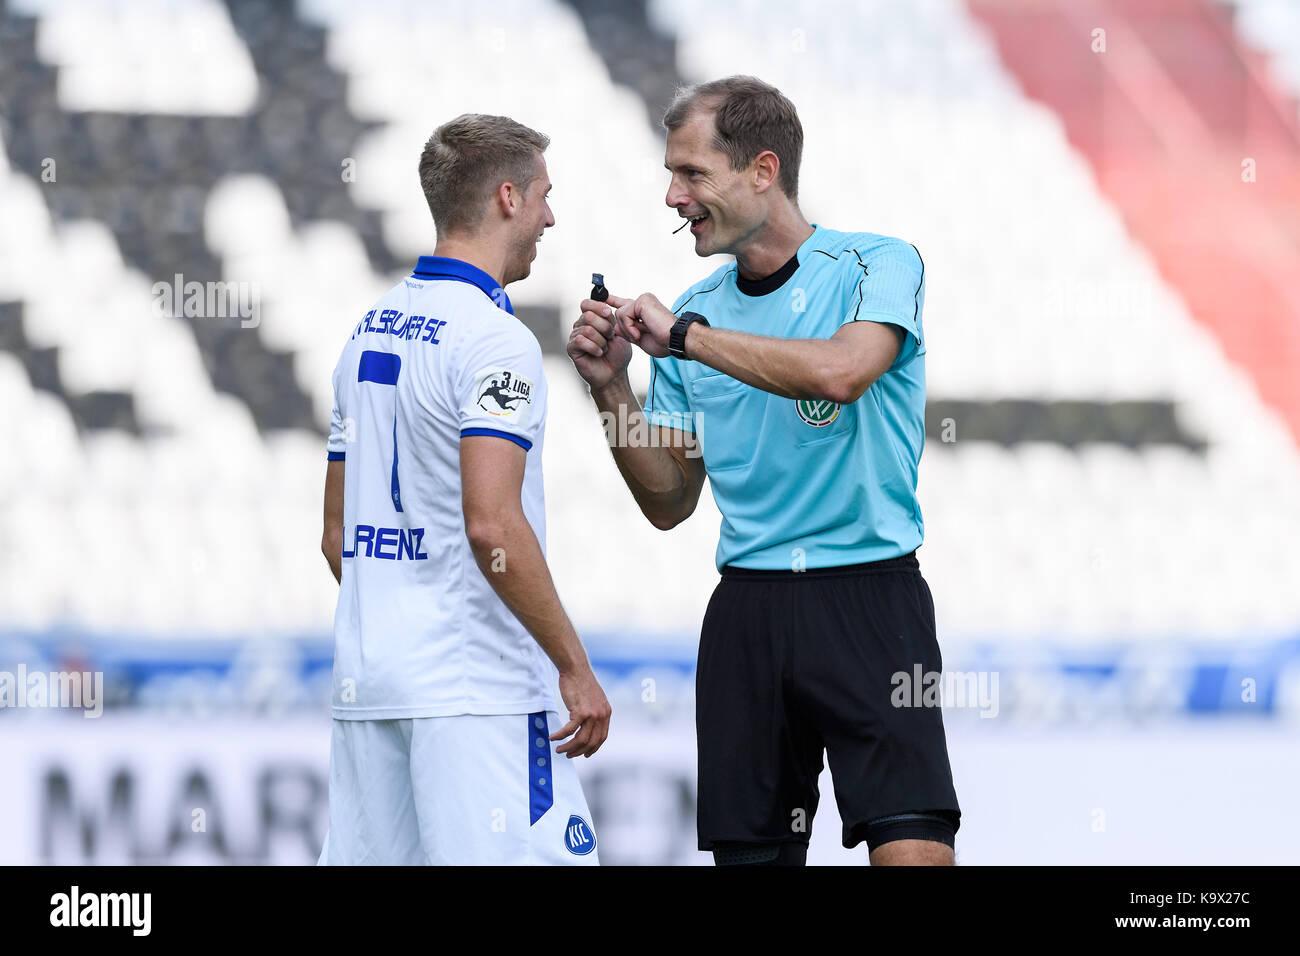 Karlsruhe, Deutschland. 24th Sep, 2017. Marc Lorenz (KSC), Schiedsrichter Rene Rohde. GES/ Fussball/ 3. Liga: Karlsruher - Stock Image